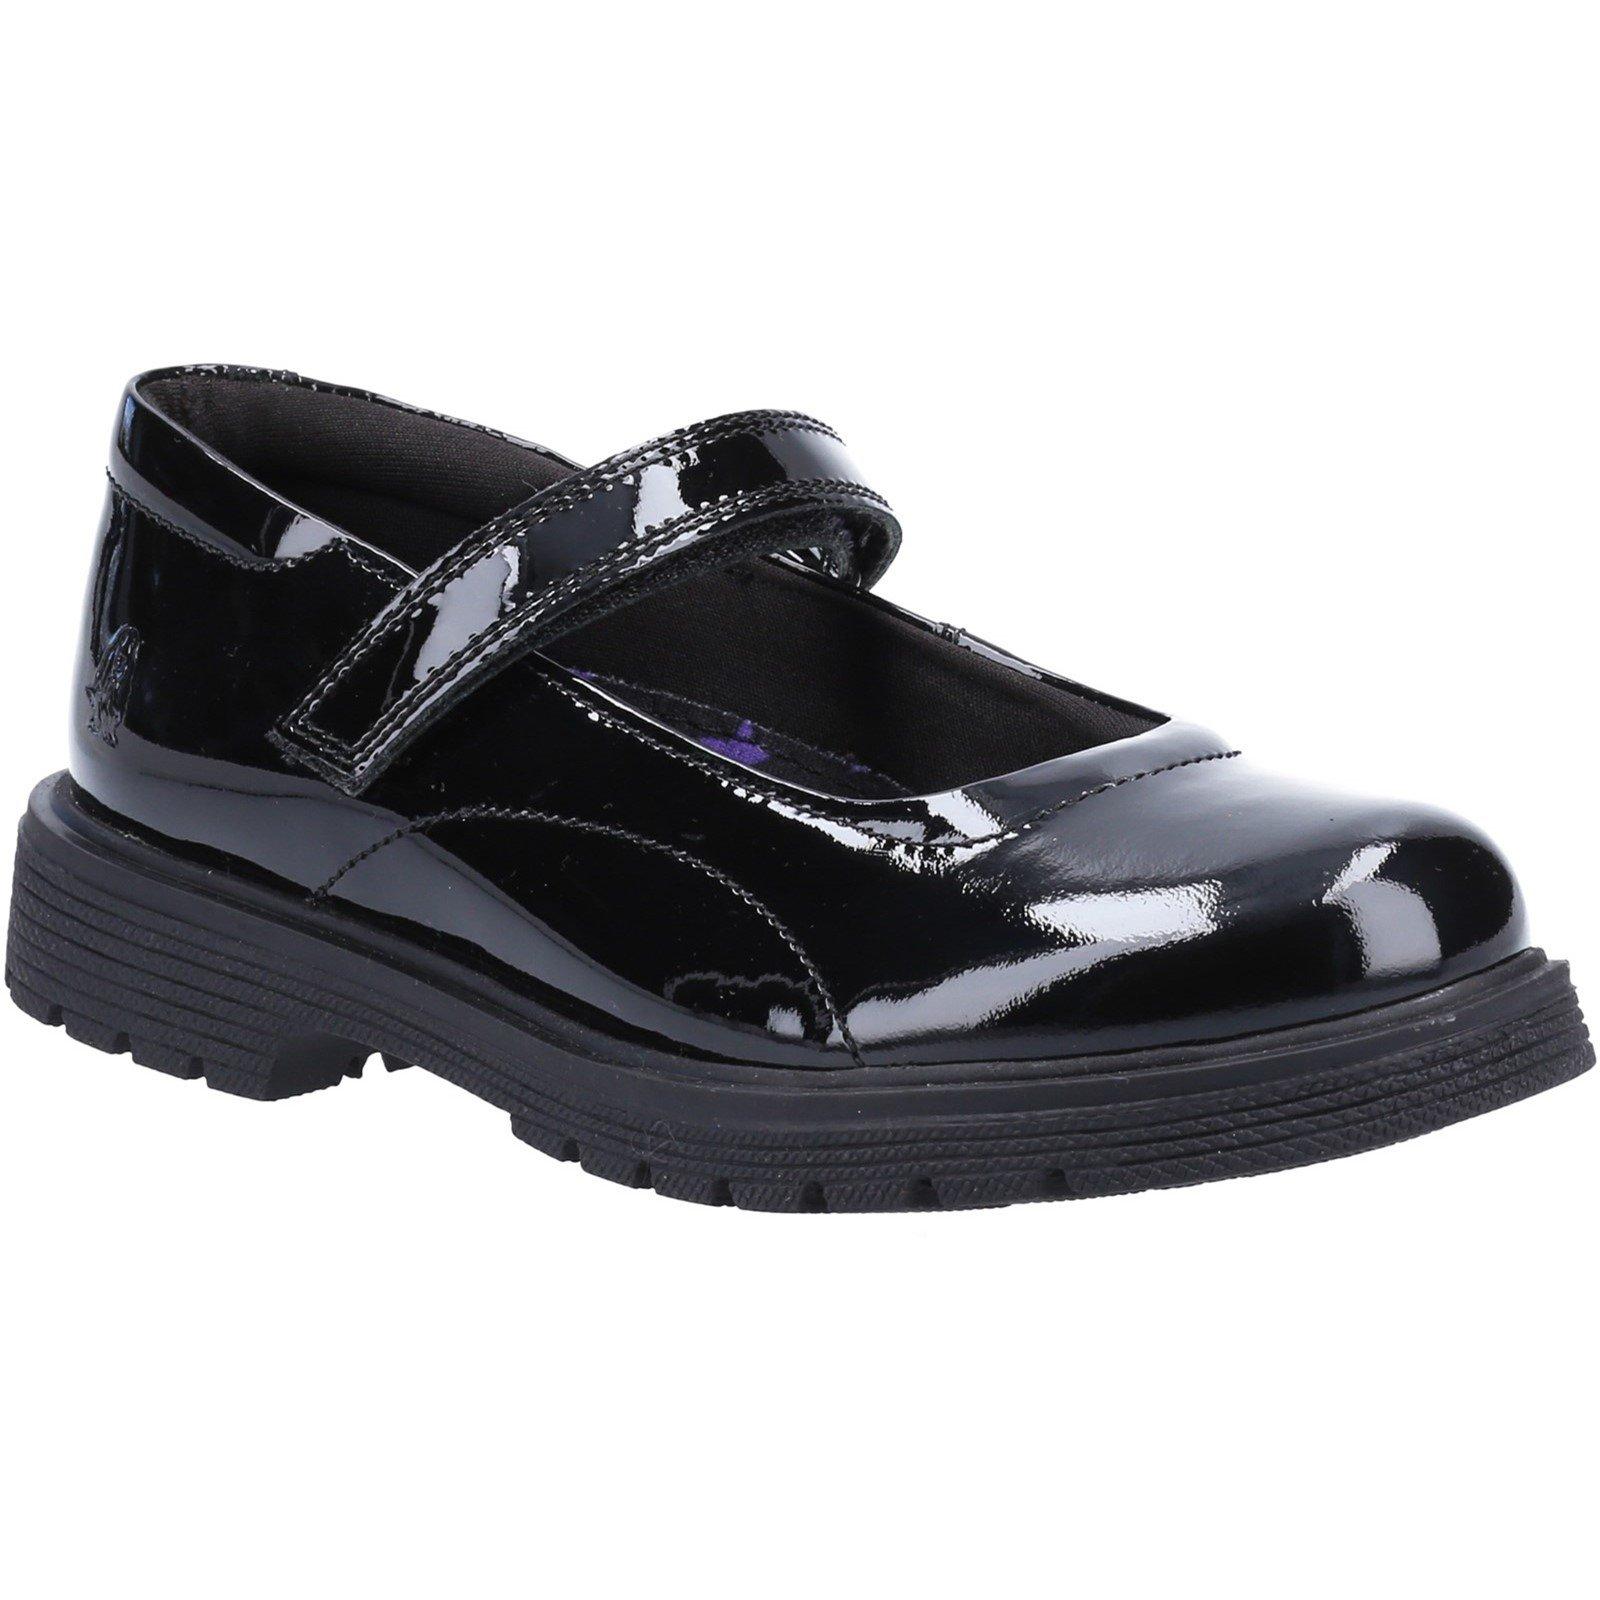 Hush Puppies Kid's Tally Senior School Flat Shoe Patent Black 32815 - Patent Black 5